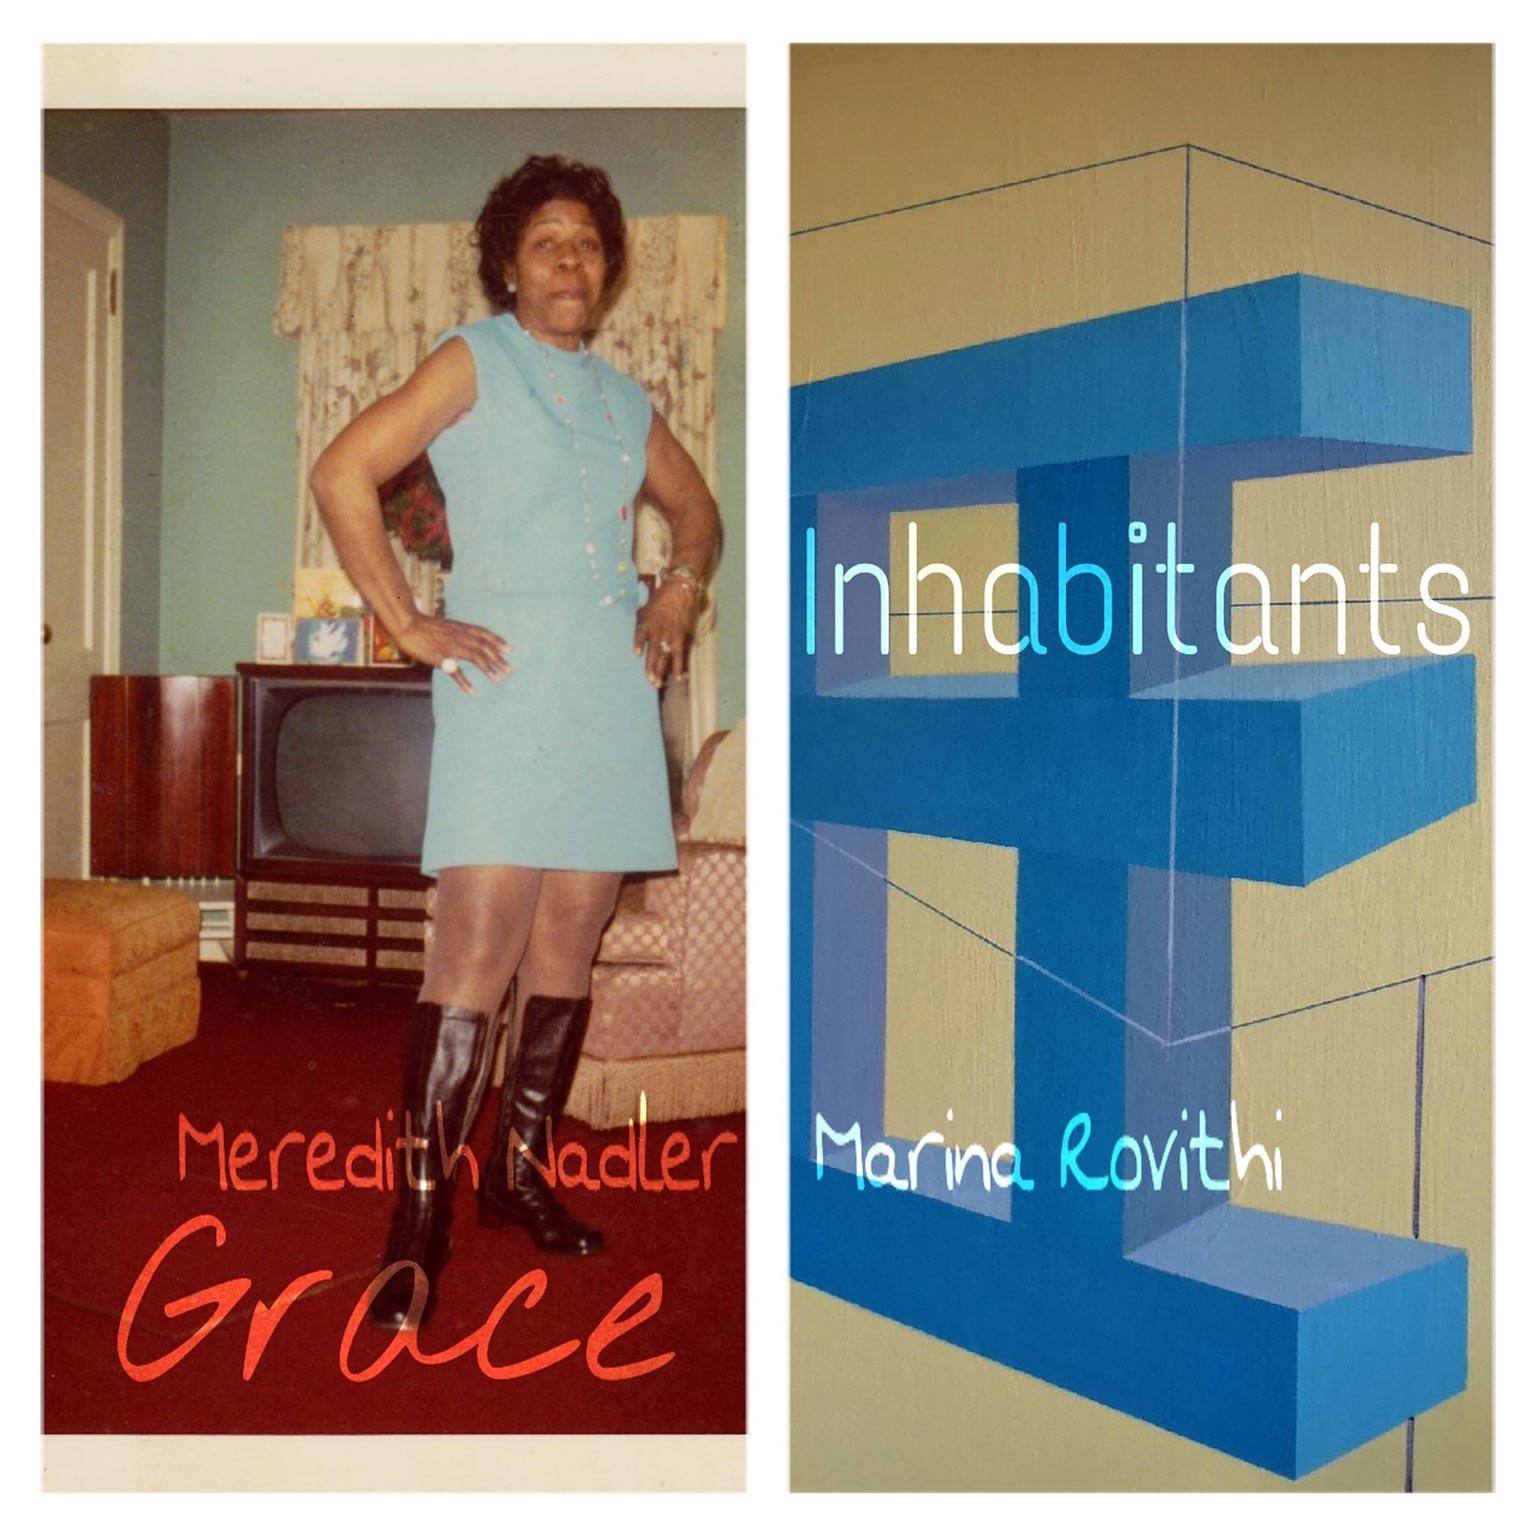 Grace - Inhabitants